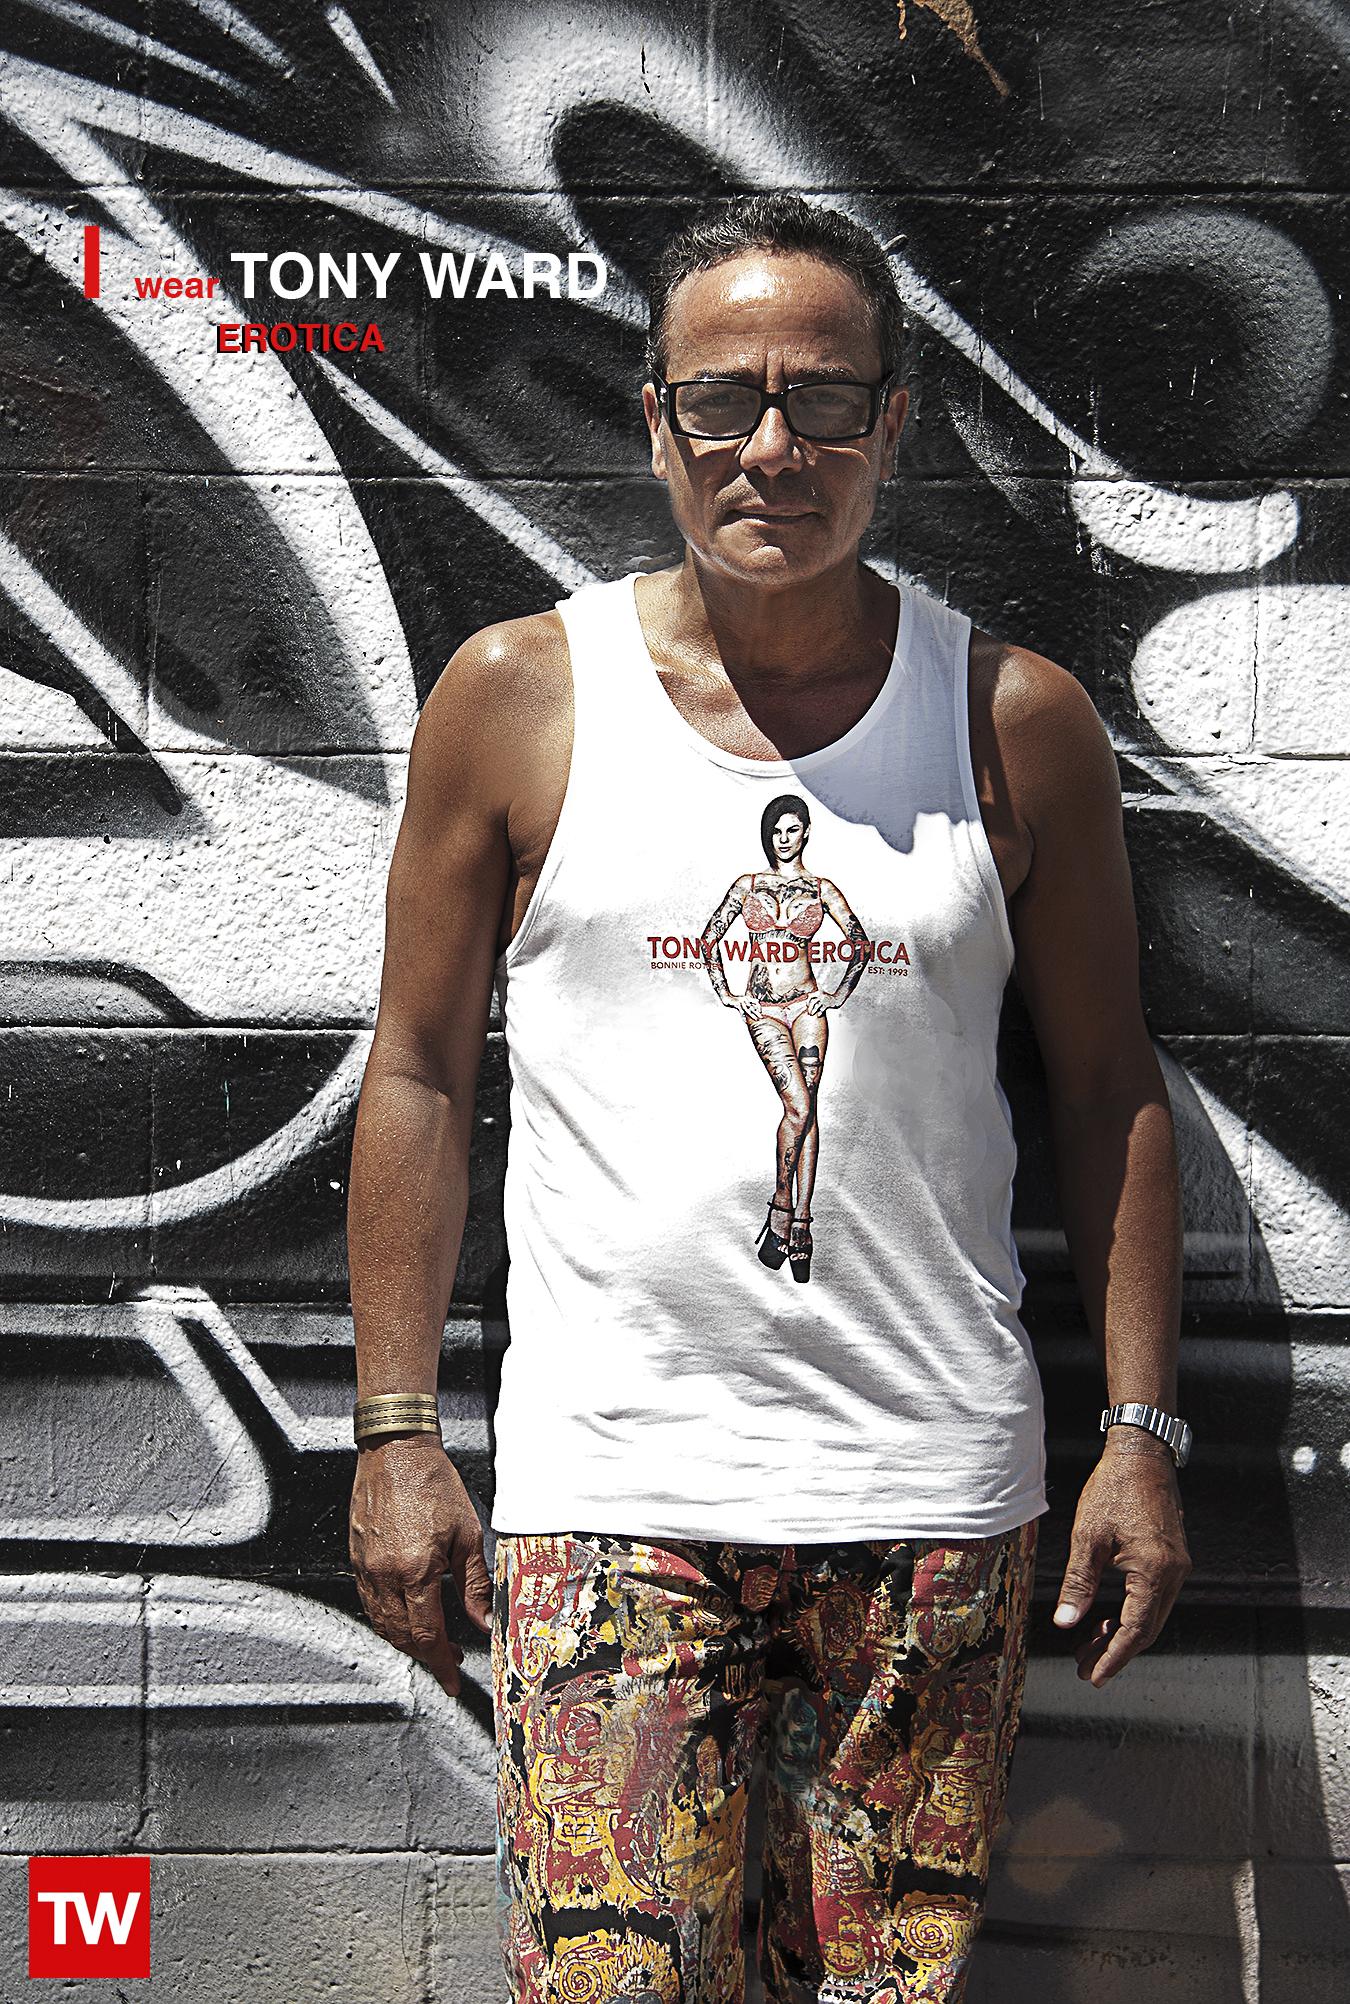 Tony_Ward_Erotica_T-shirts_white_tank_Bonnie_Rotten_store_